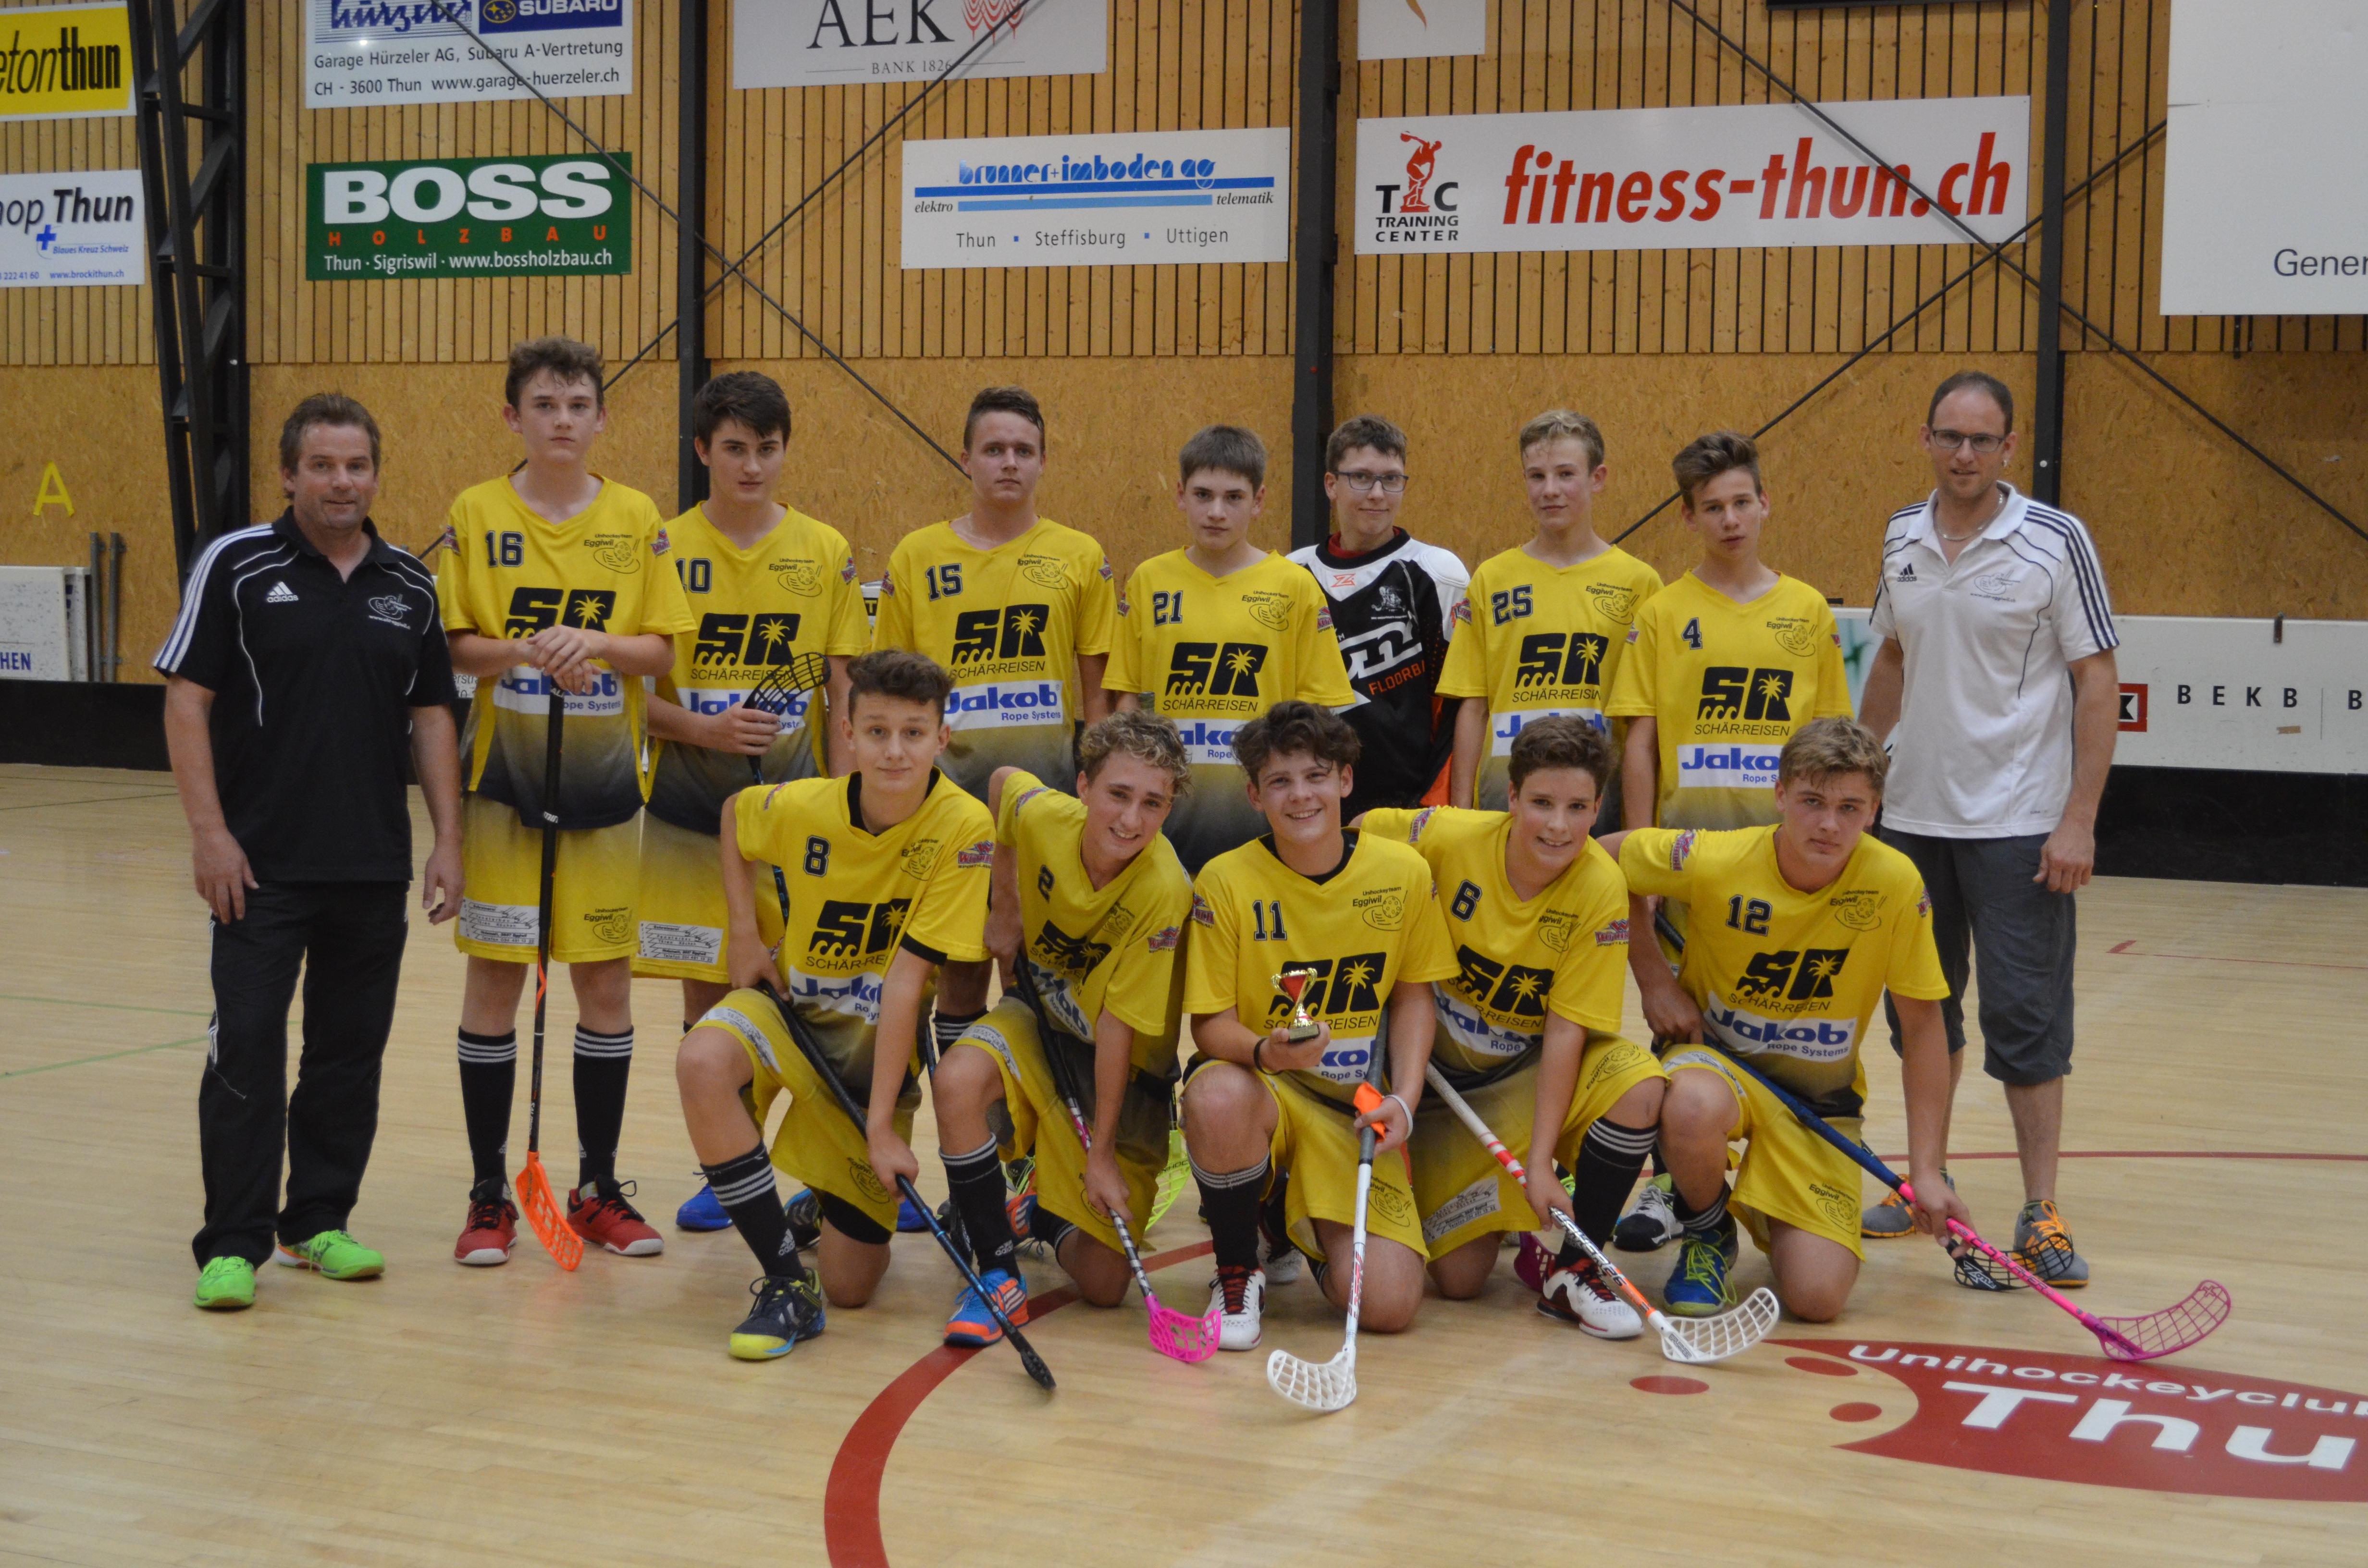 Junioren U16 - Thuner Cup 2016